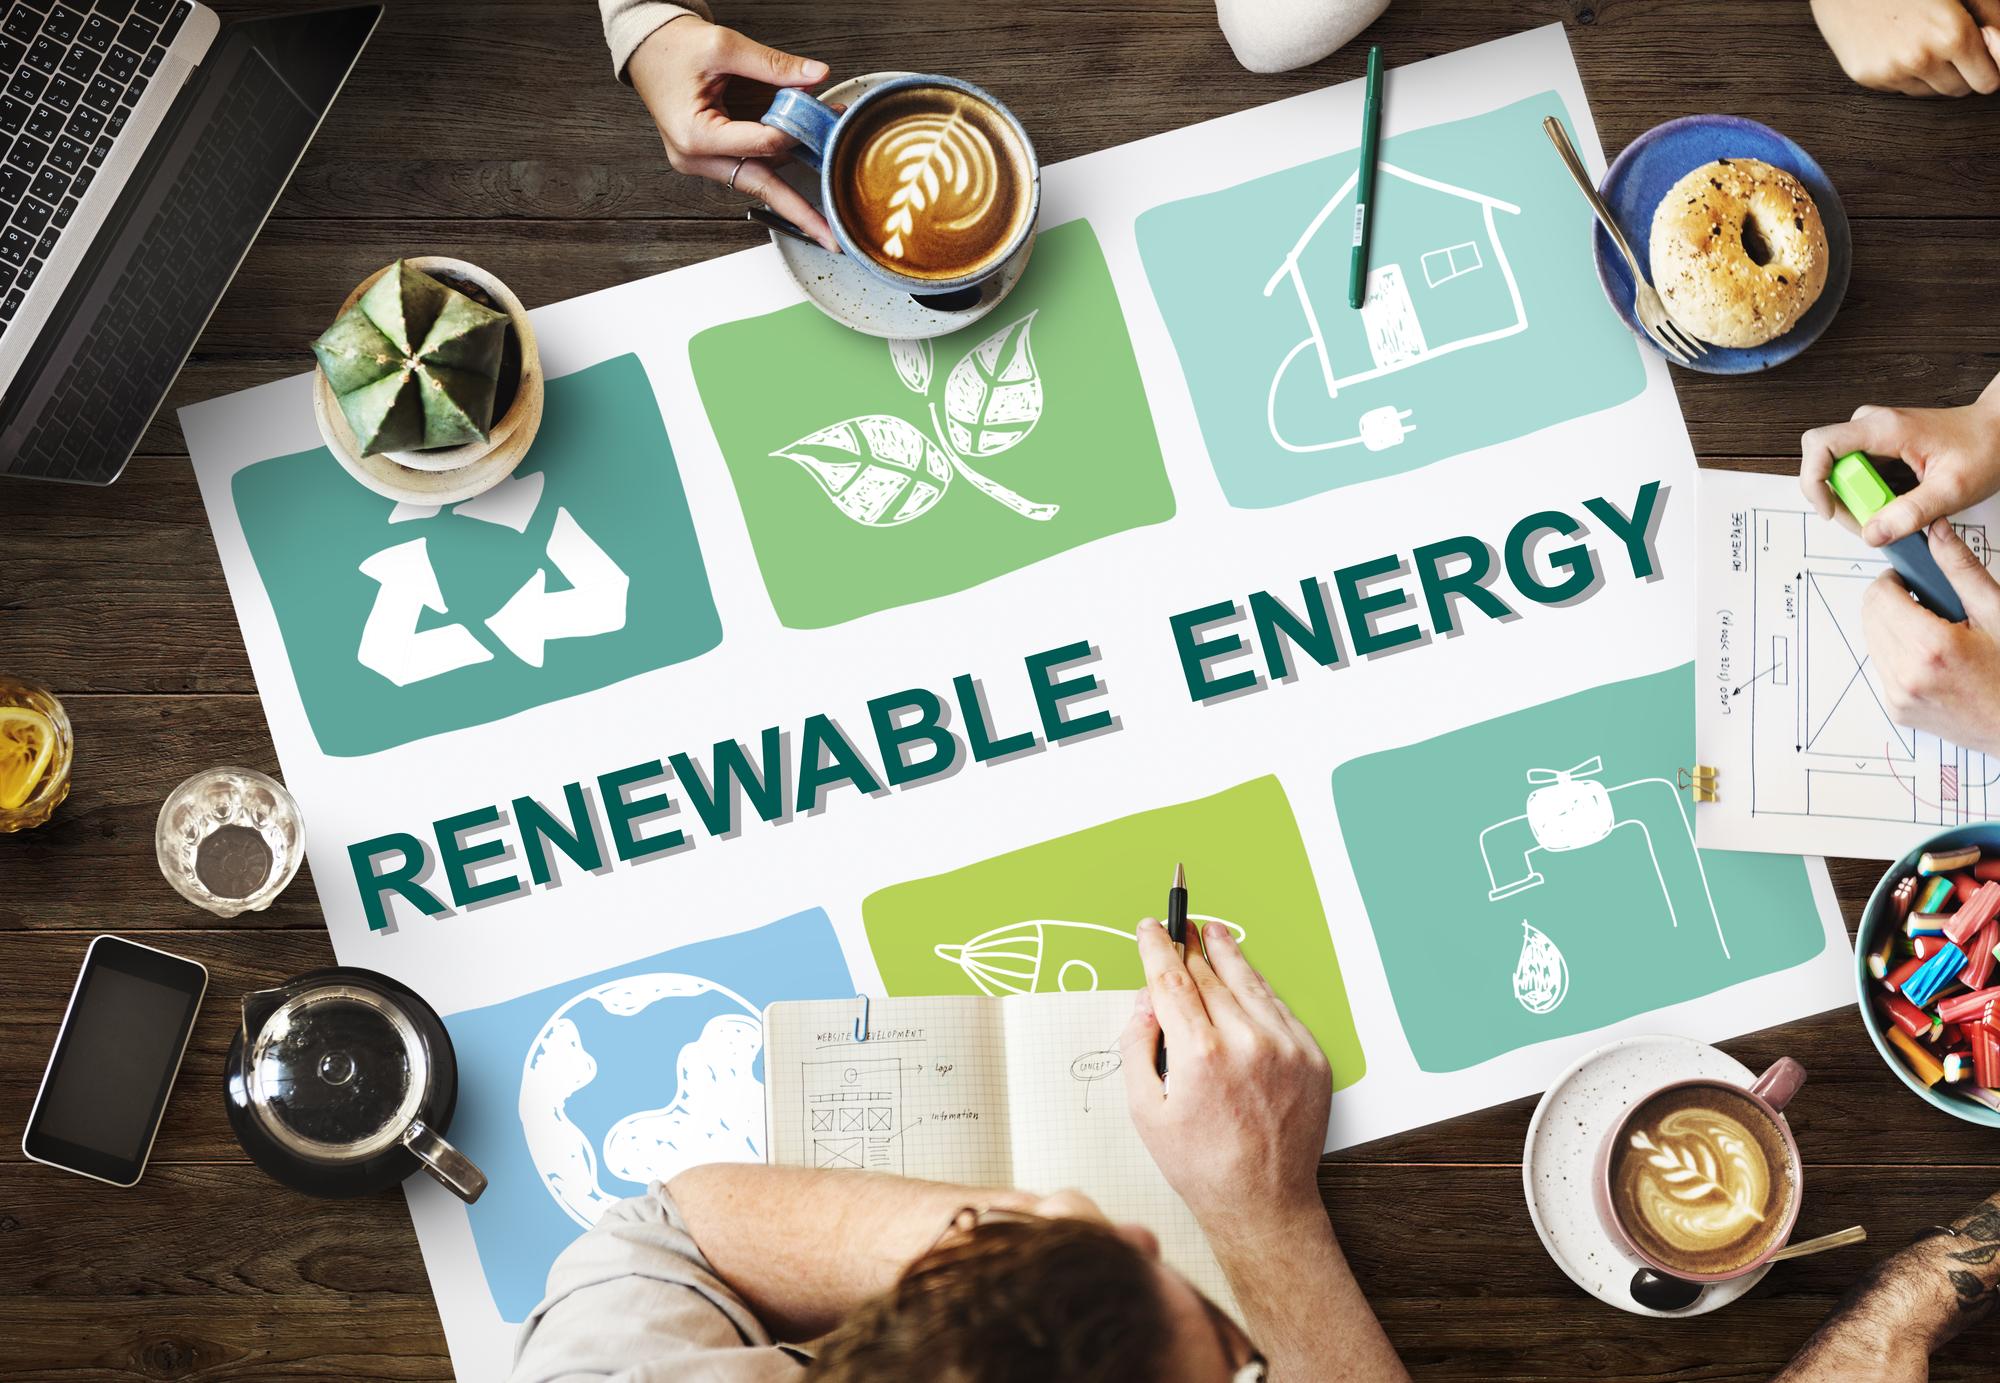 Renewable energy planning illustration